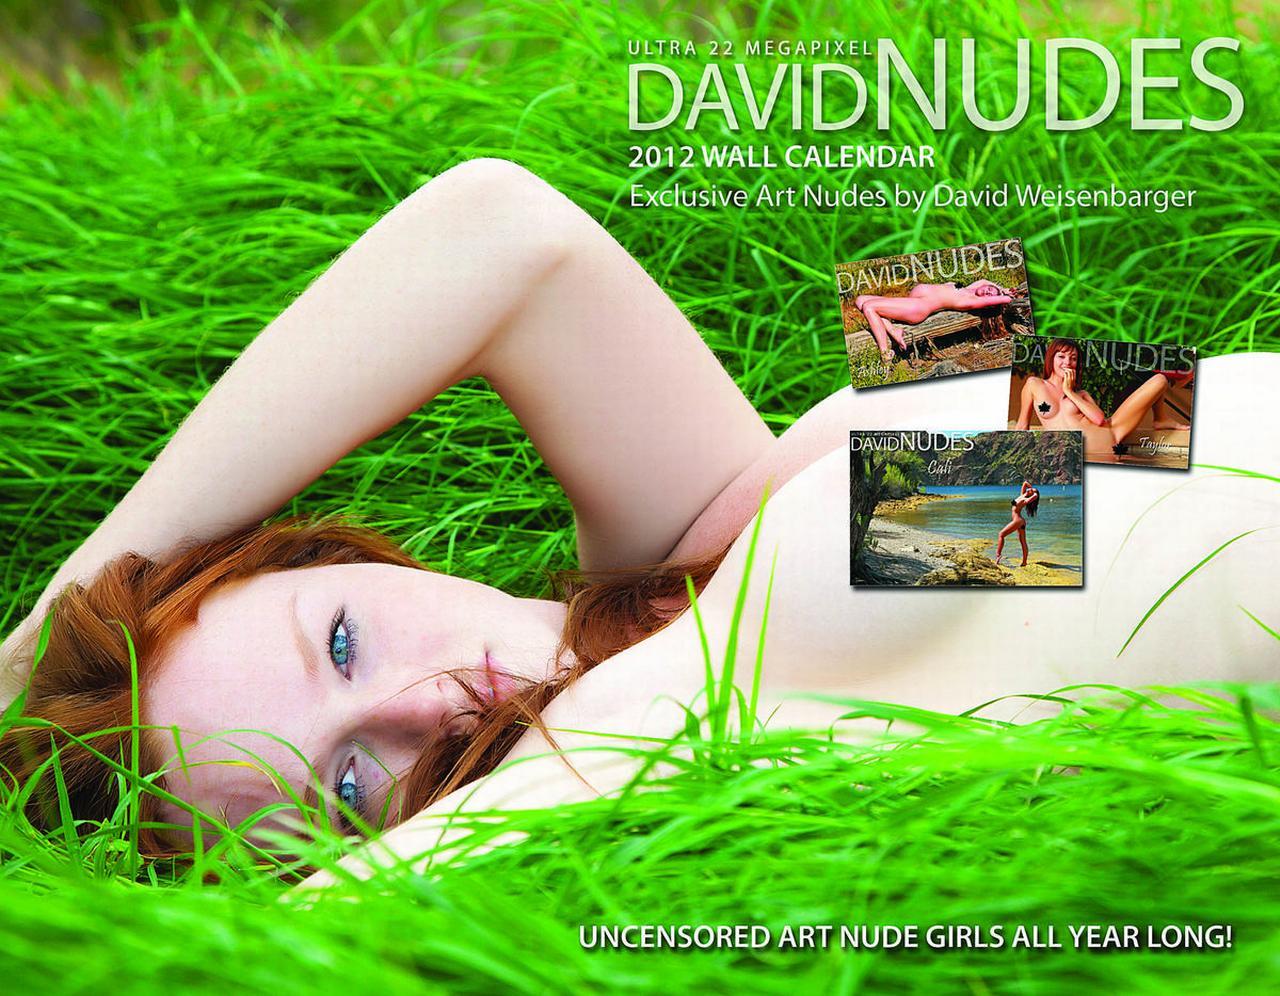 With you Nude teen girl sleep pic opinion